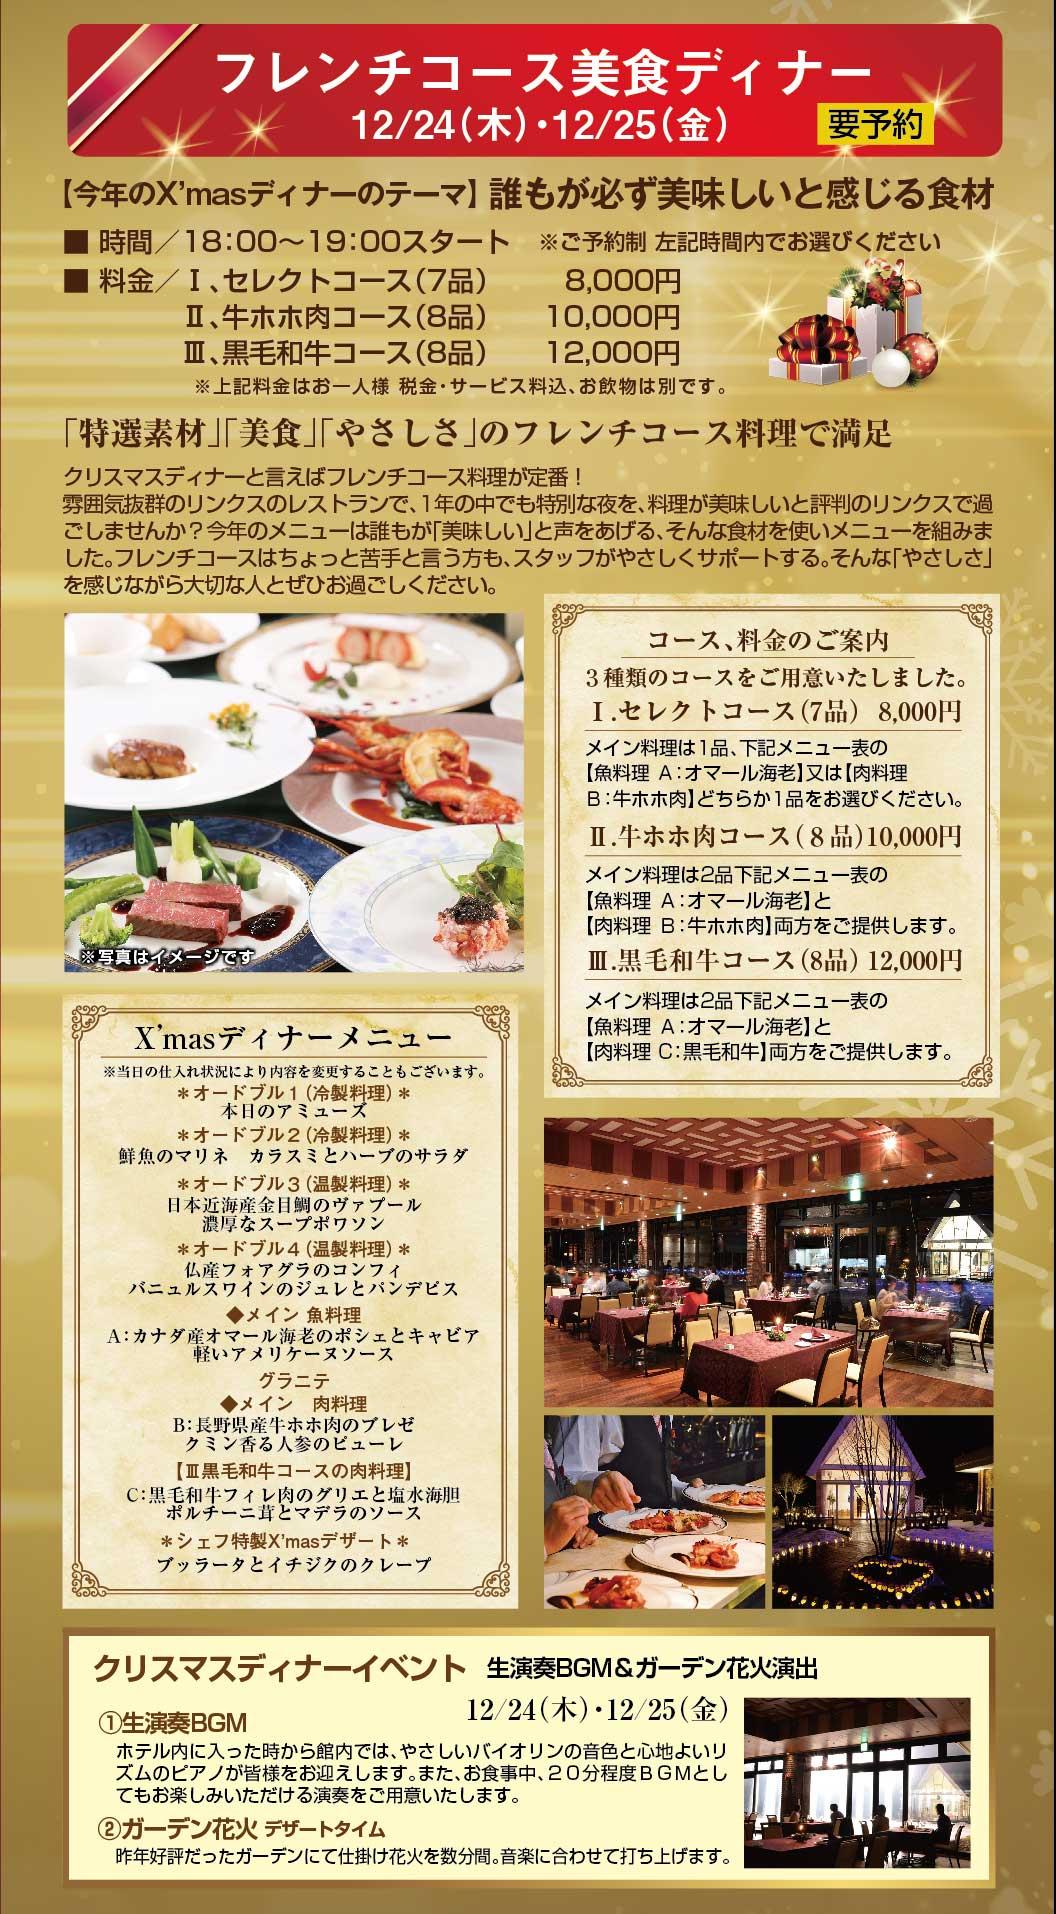 http://www.komagane-linx.co.jp/blogimages/kamiina201512-03.jpg